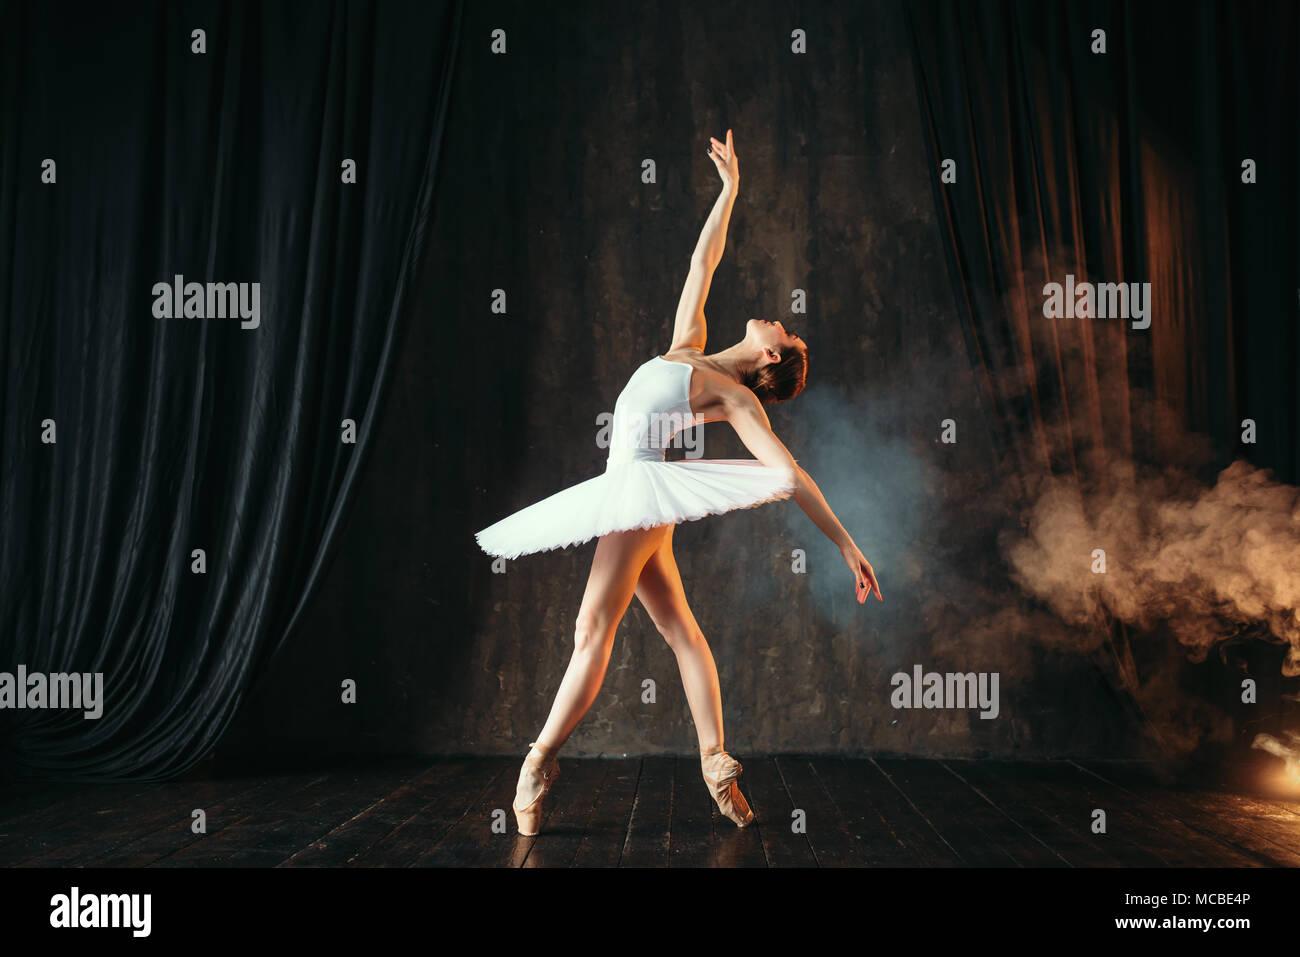 Ballerina in white dress dancing in ballet class - Stock Image